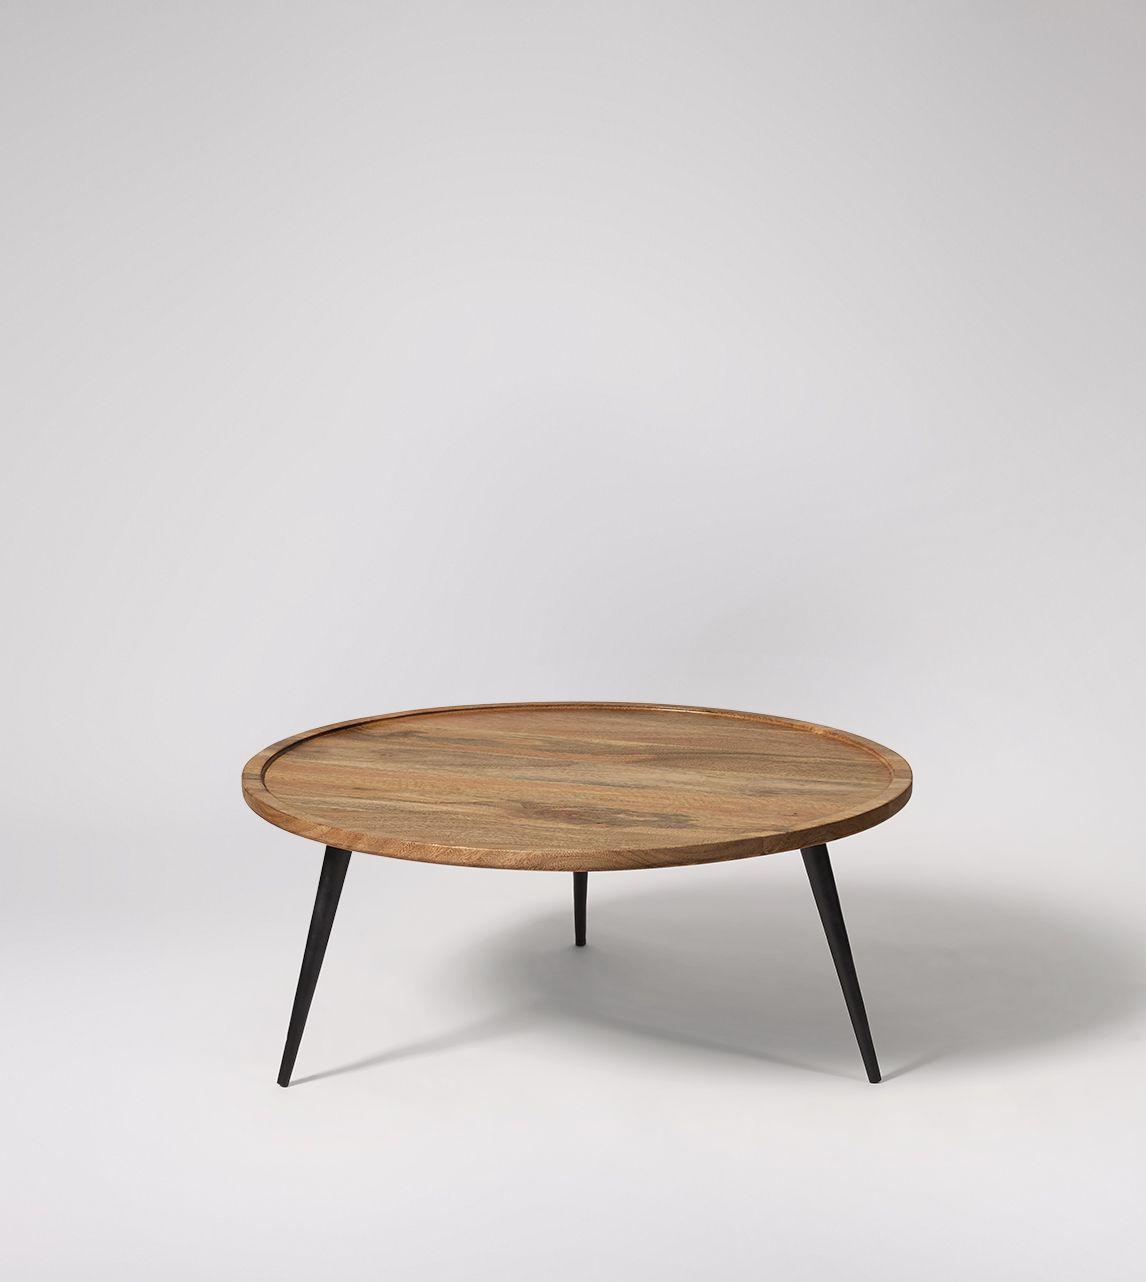 Tabak Coffee Table Industrial Style In Natural Mango Wood Black Steel Coffee Table Round Wood Coffee Table Round Industrial Coffee Table [ 1282 x 1146 Pixel ]